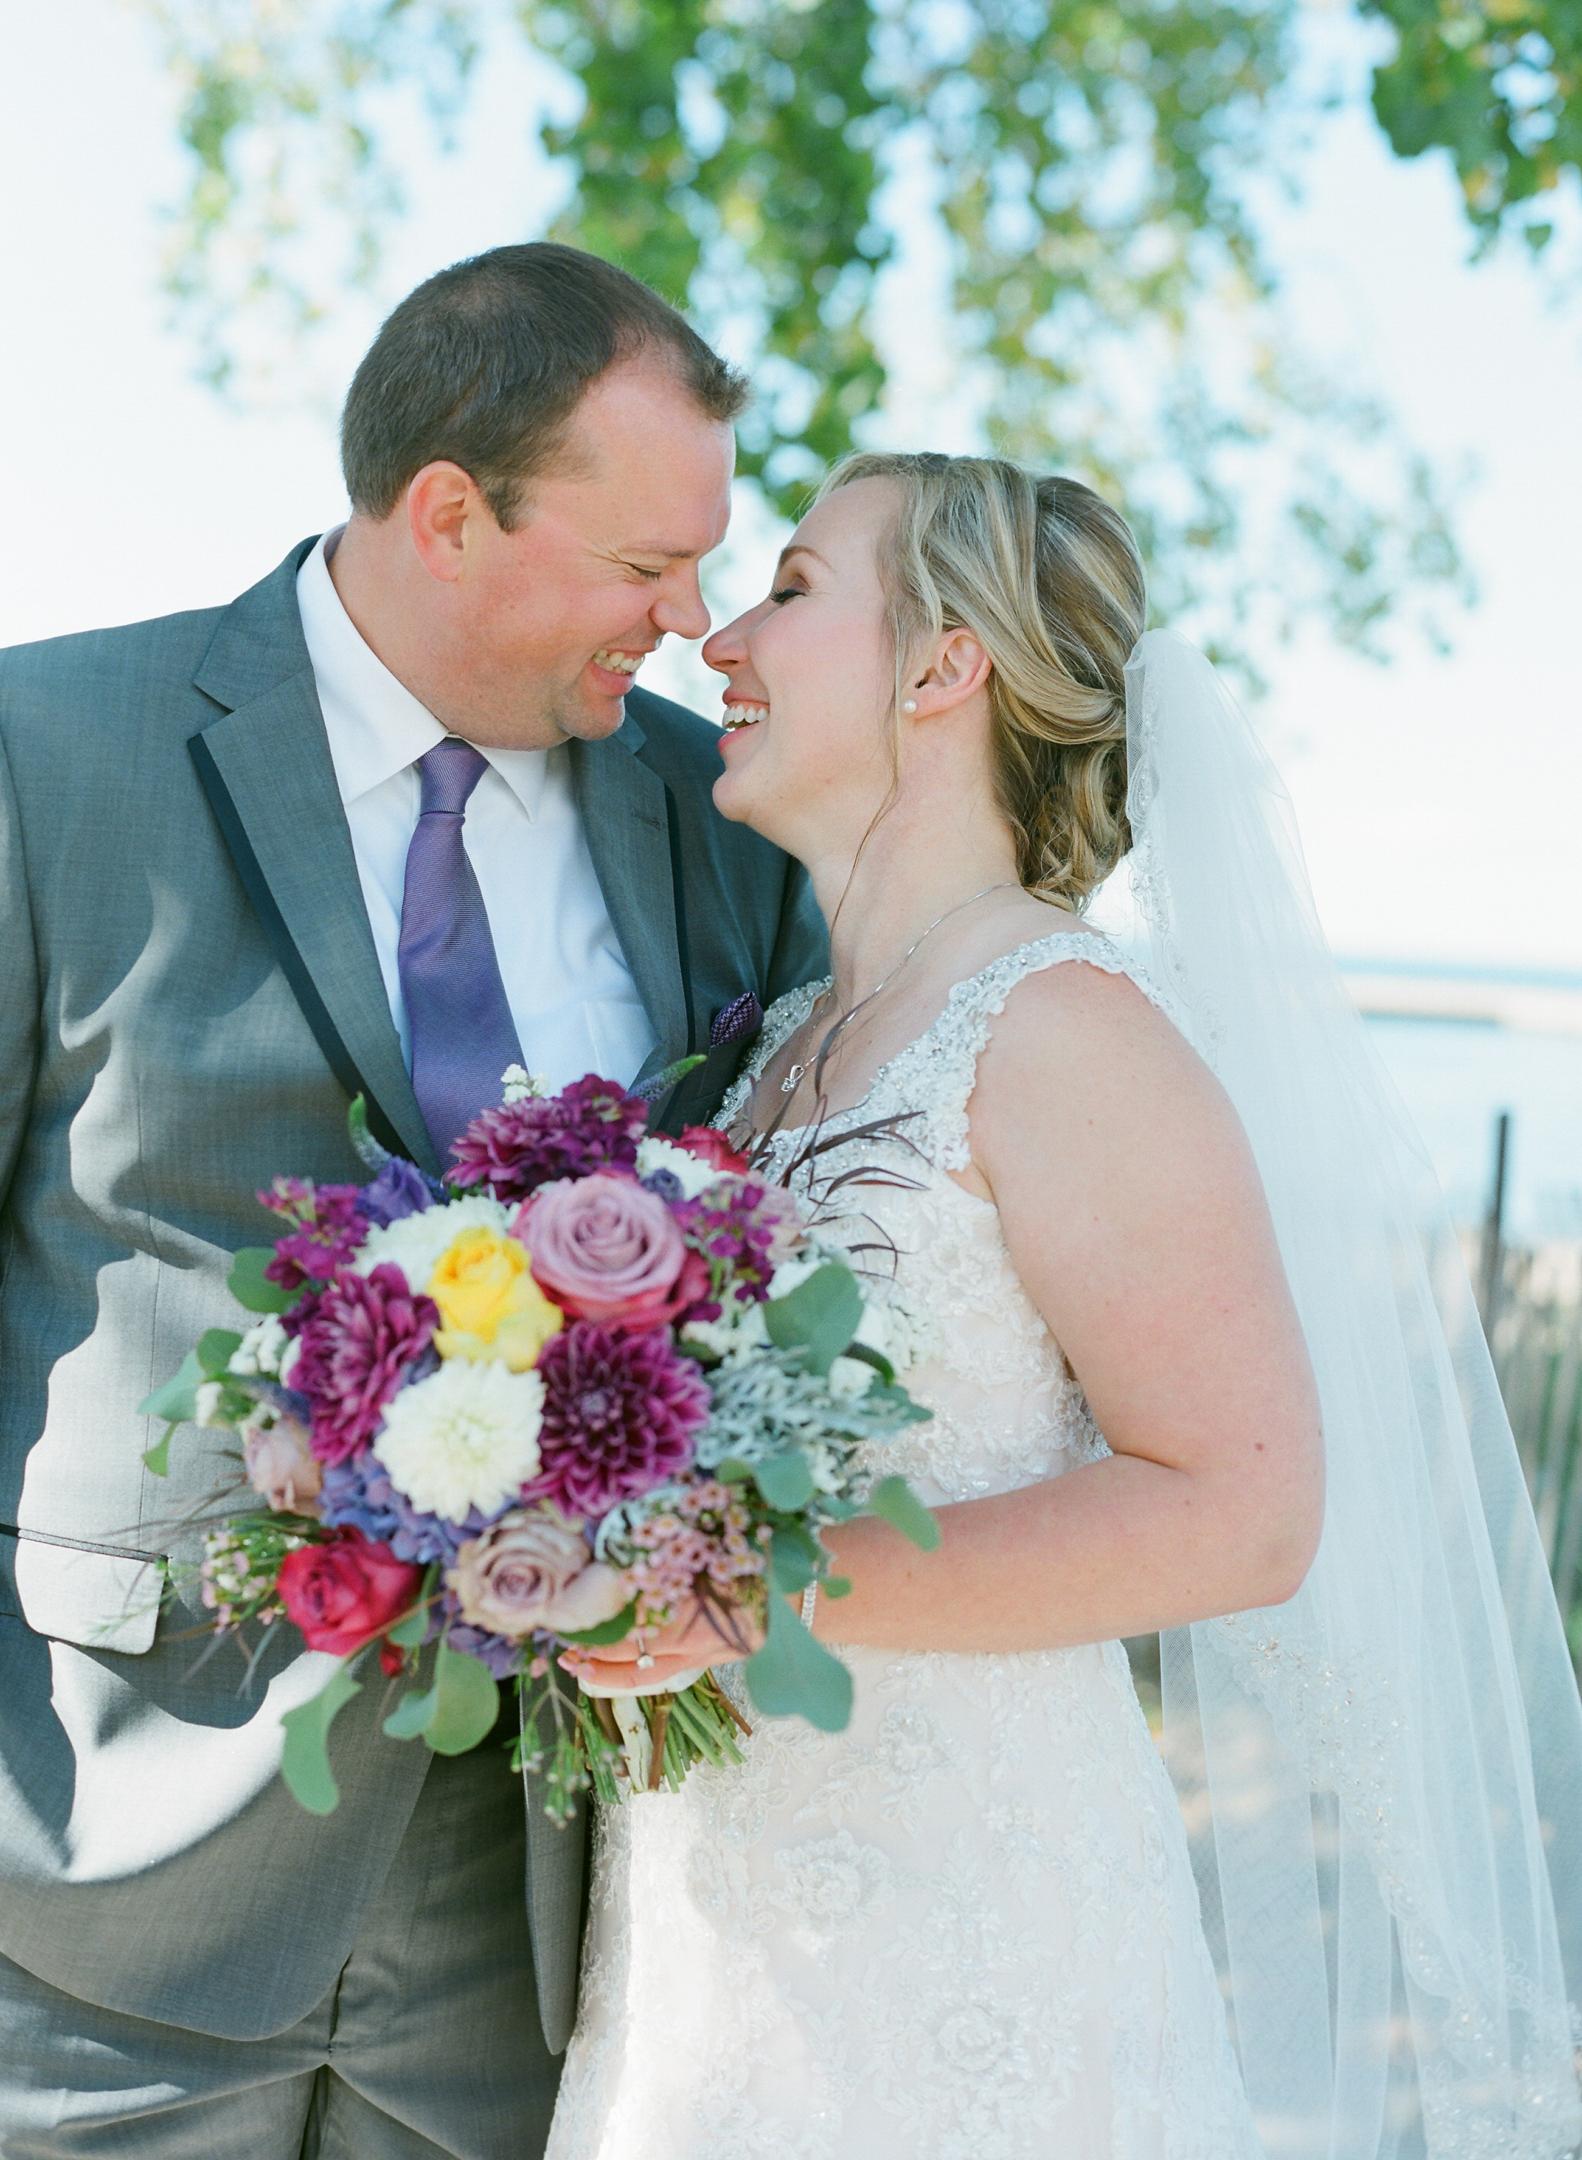 adorable happy bride and groom portrait at murphy park in door county, wi